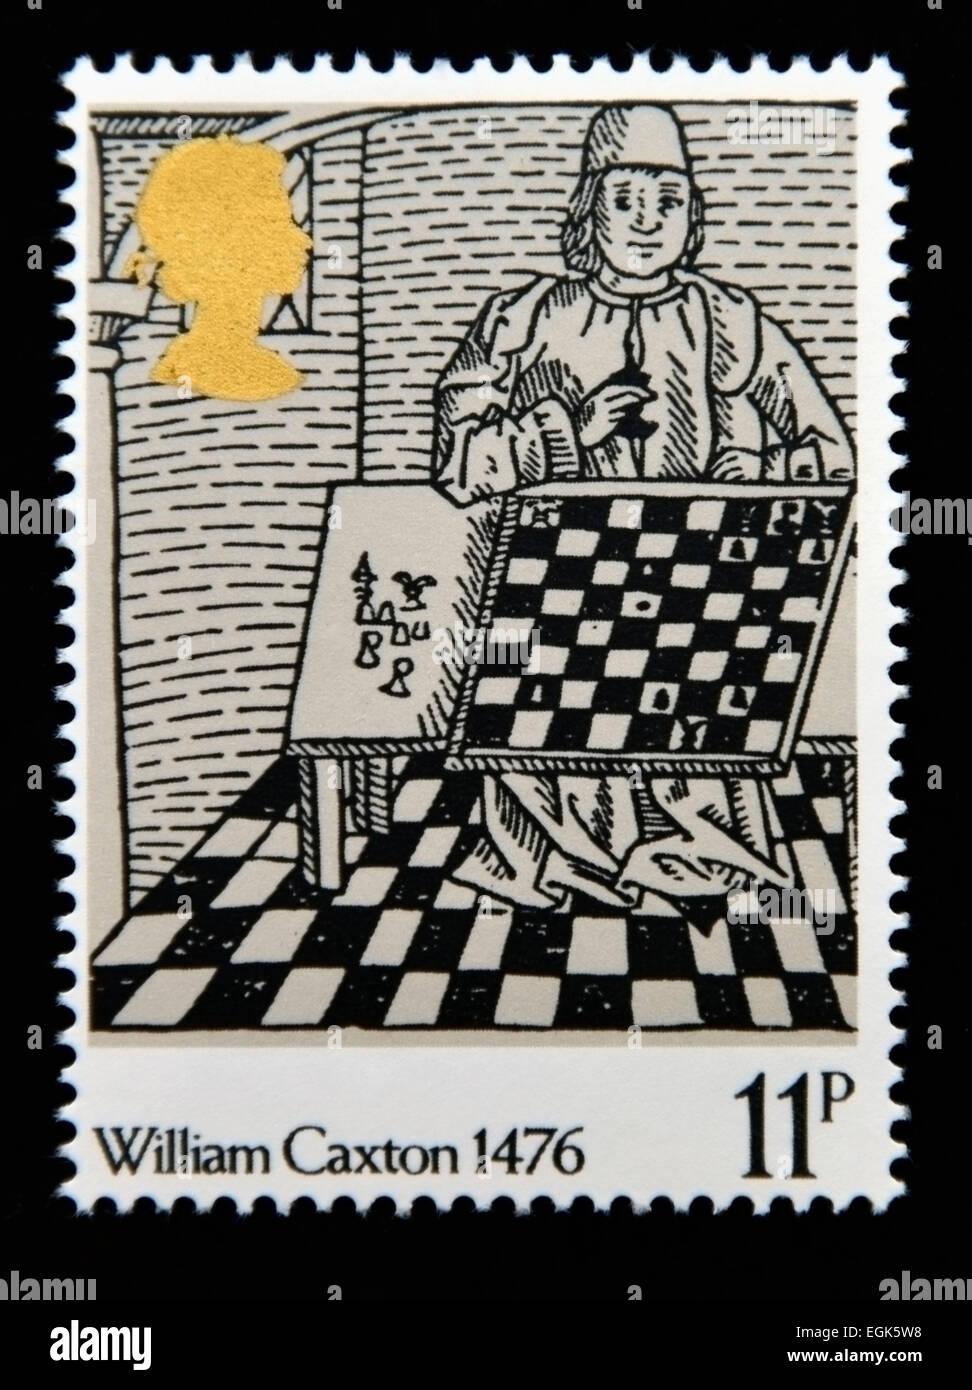 Postage stamp. Great Britain. Queen Elizabeth II. 1976. 500th.Anniversary of British Printing. William Caxton 1476. - Stock Image